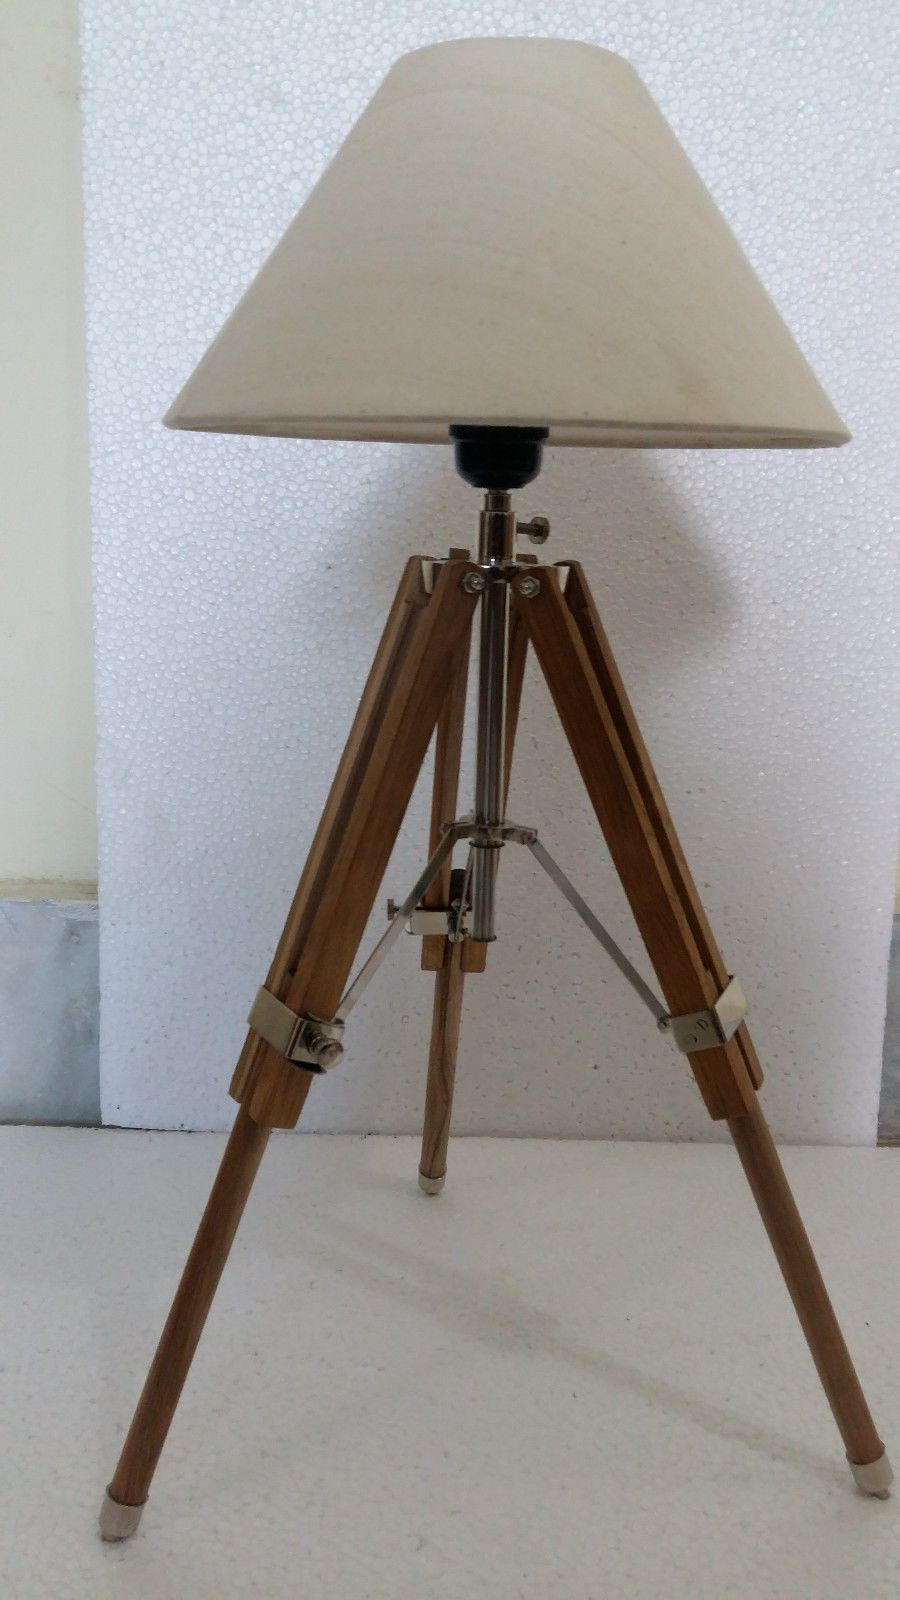 Brand Vintage Designer Nautical Floor Lamp Tripod Floor Lamp Stand Hand Crafted Stunning Designer Nautical Search Ligh Floor Standing Lamps Lamp Floor Lamp